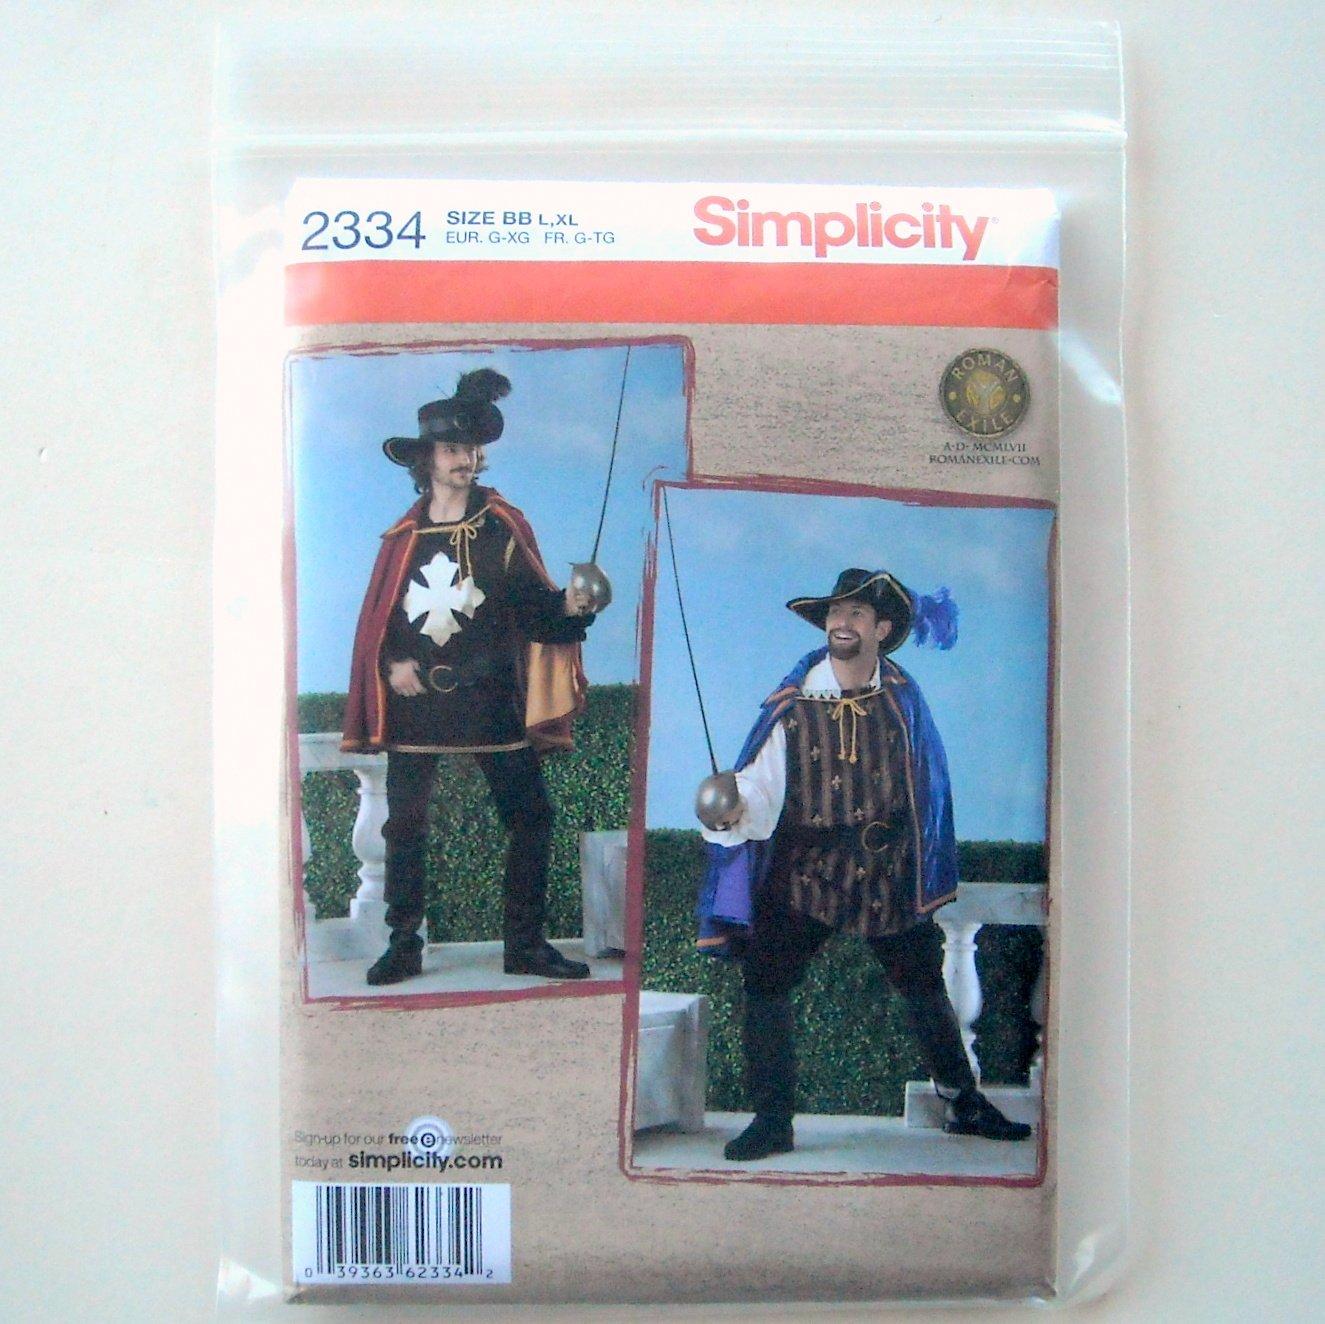 Musketeer Costume Cape Shirt Hat Belt L XL Simplicity Sewing Pattern 2334 7fb1c652d8e